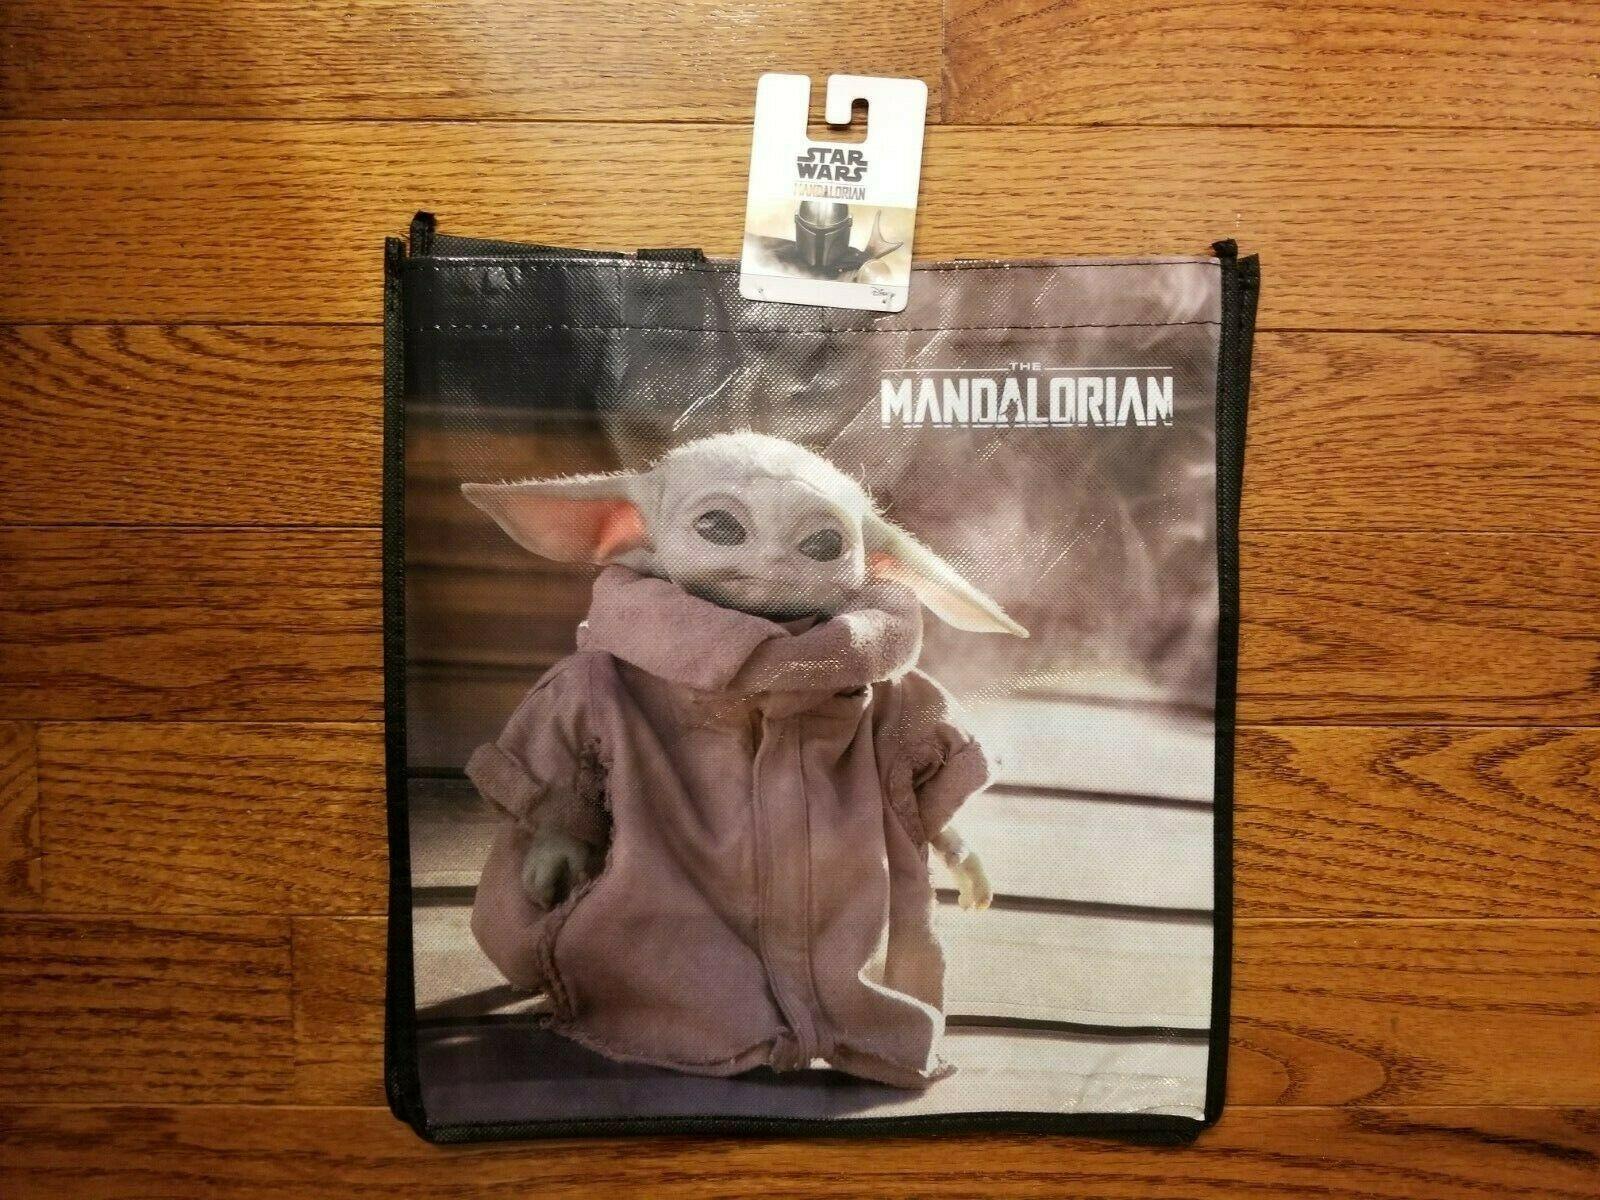 Star Wars: The Mandalorian Baby Yoda The Child Grogu Reusable Tote Bag